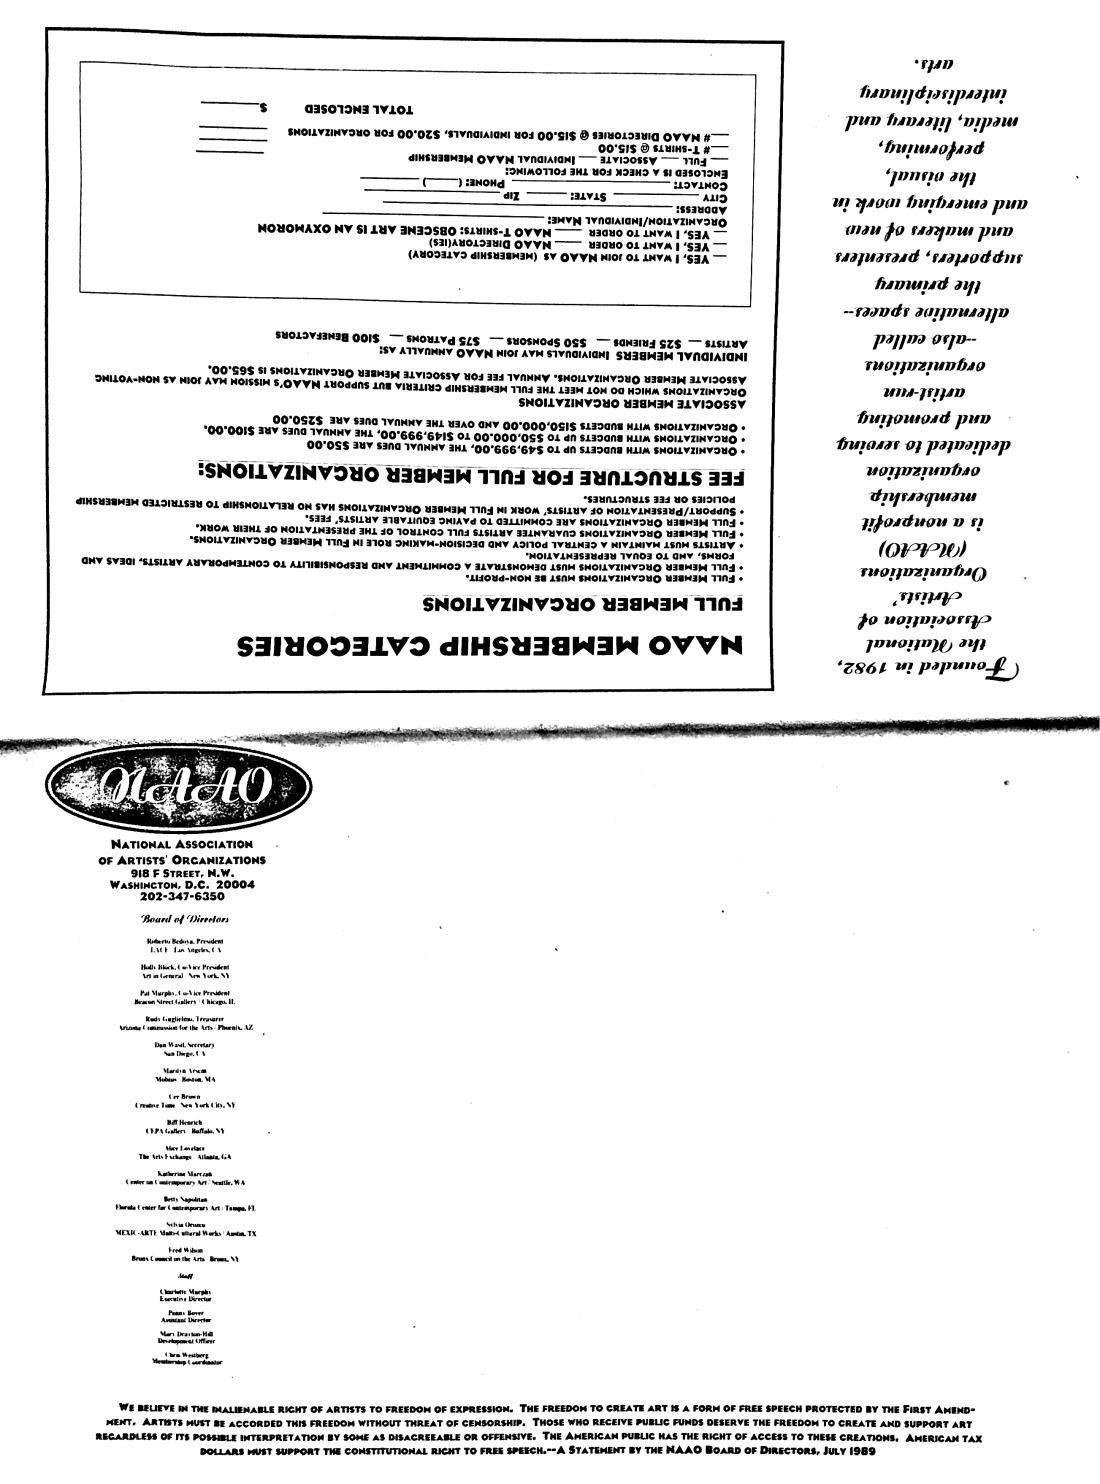 November 1990 - NAAO Bulletin Page 16.jpg